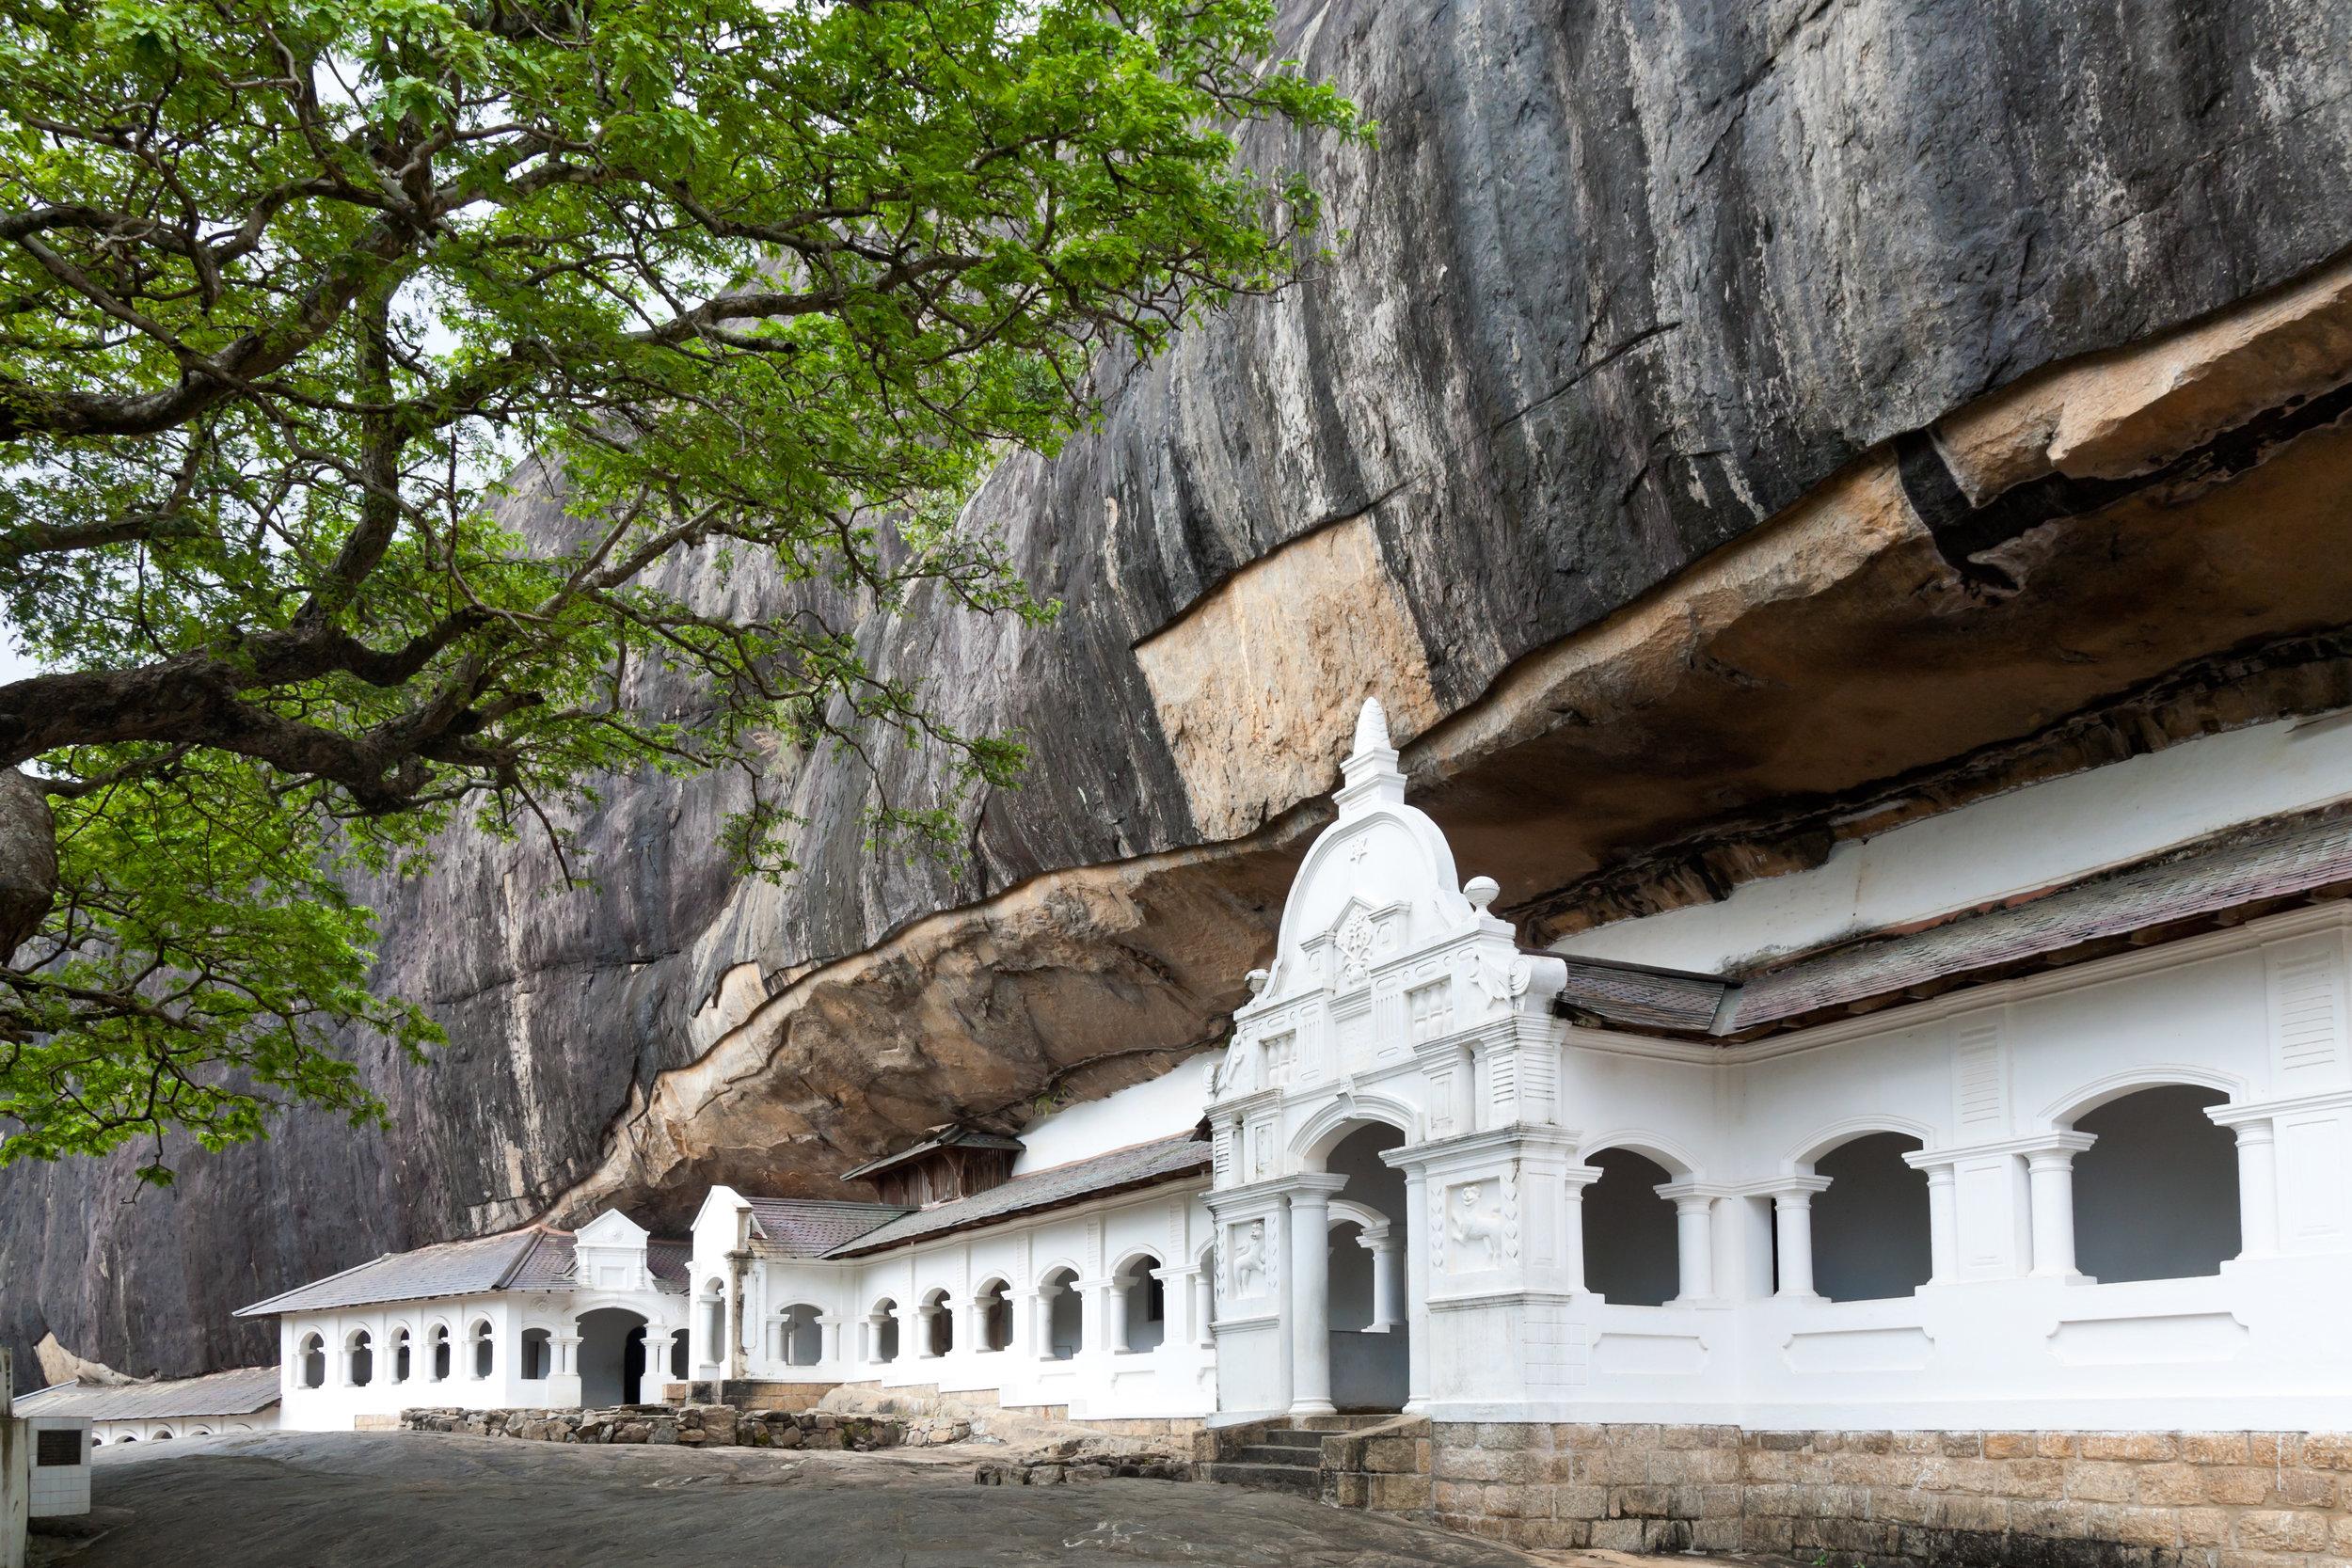 invite-to-paradise-sri-lanka-holiday-honeymoon-cultural-triangle-dambulla-cave-temple-.jpg